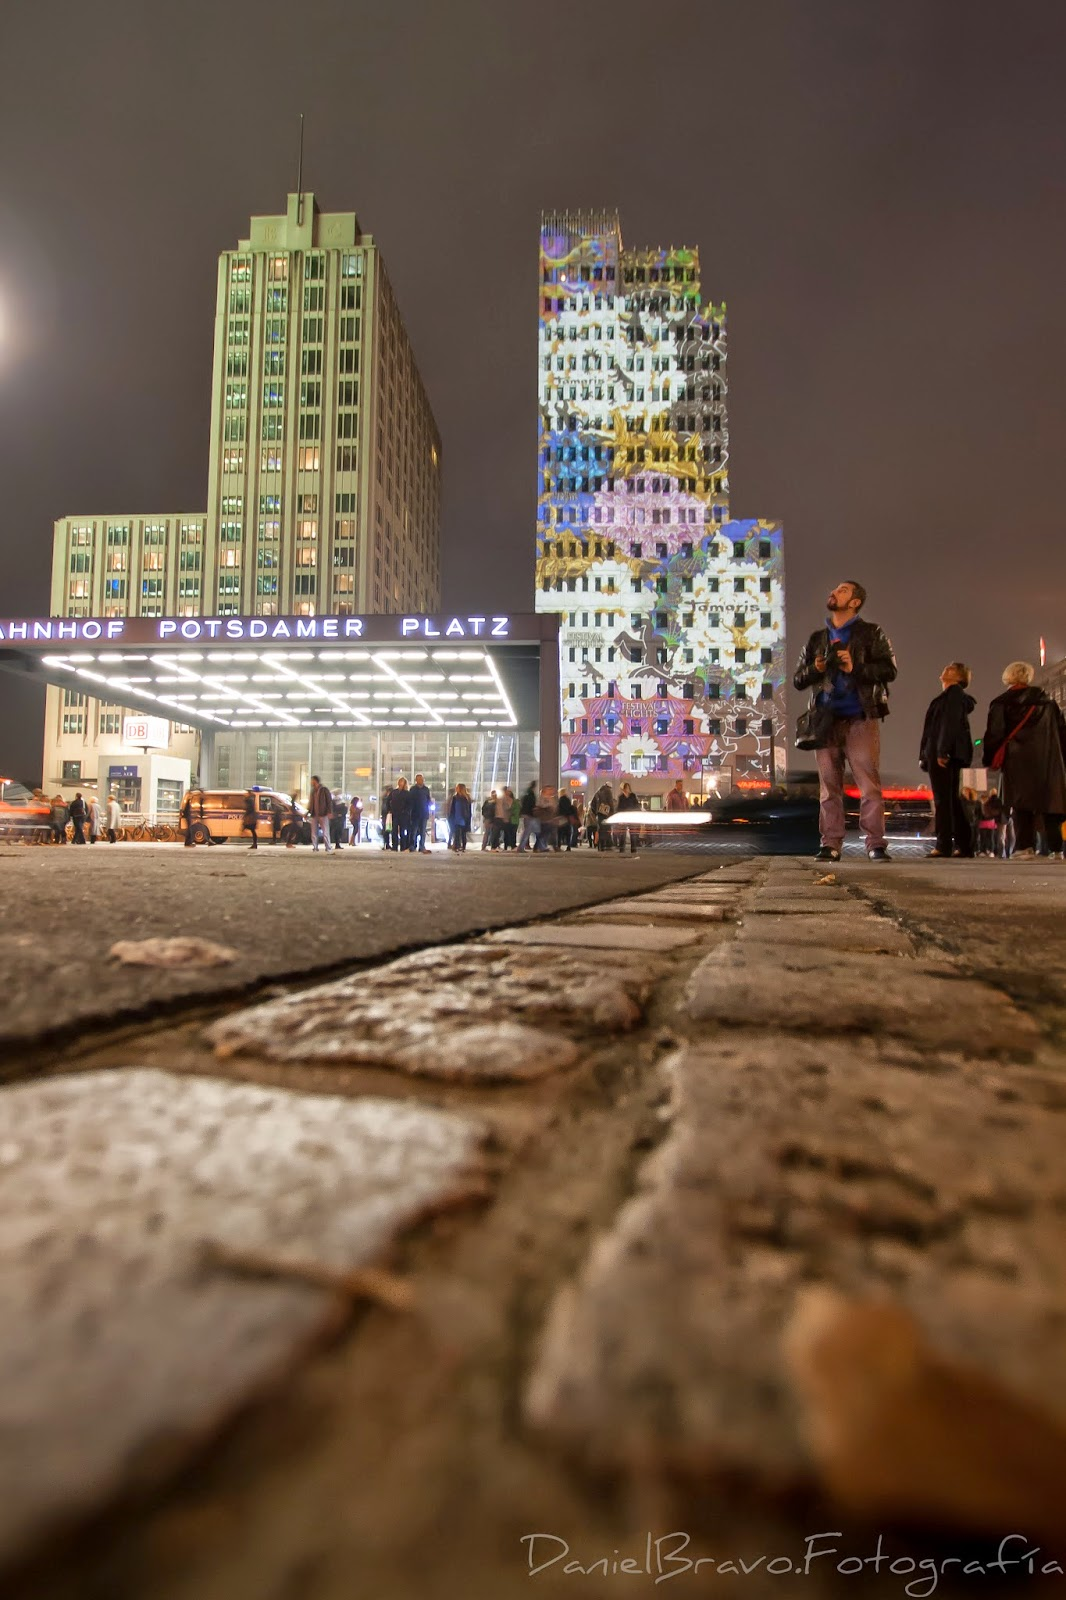 Berlín, muro de Berlín, ladrillos, suelo, huella muro de Berlín, bicicletas, Postdamer Platz, Berlin